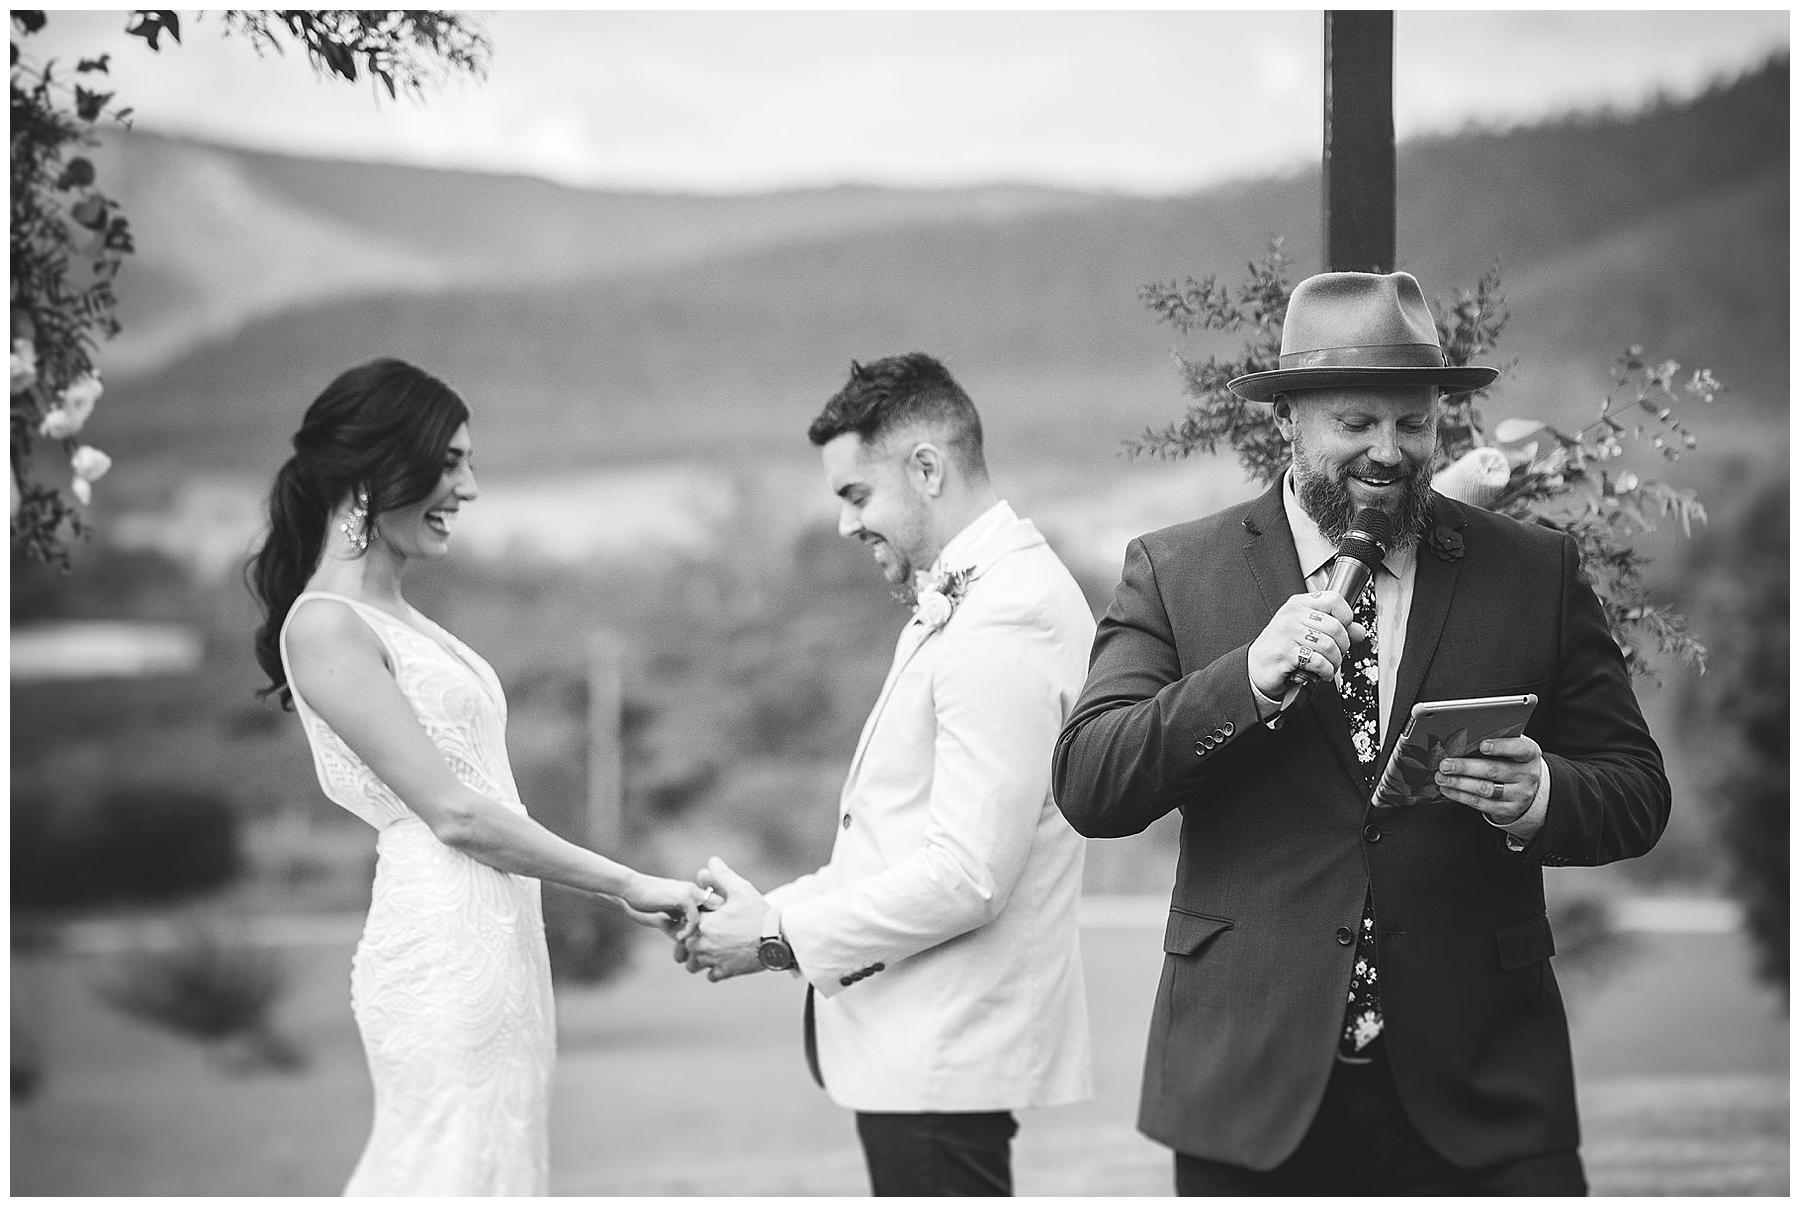 Adam's Peak Wedding Photos + Popcorn Photography_0024.jpg